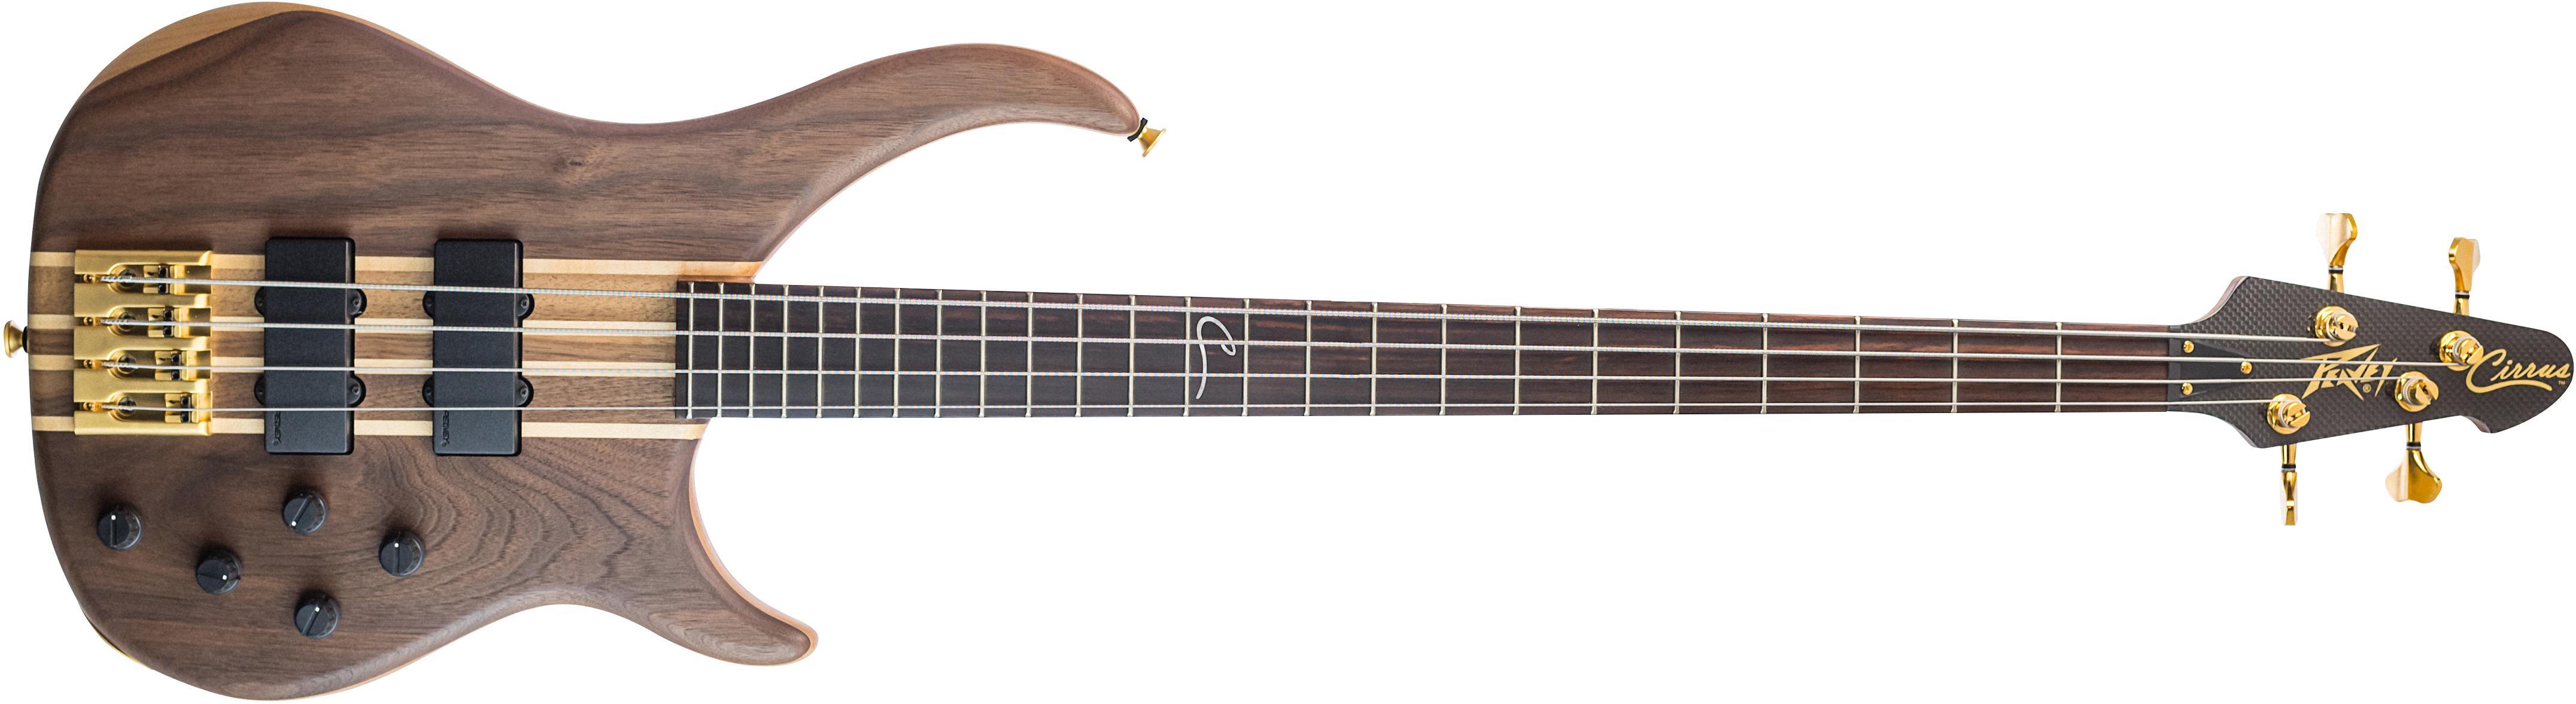 cirrus 4 walnut 4 string bass guitar peavey. Black Bedroom Furniture Sets. Home Design Ideas